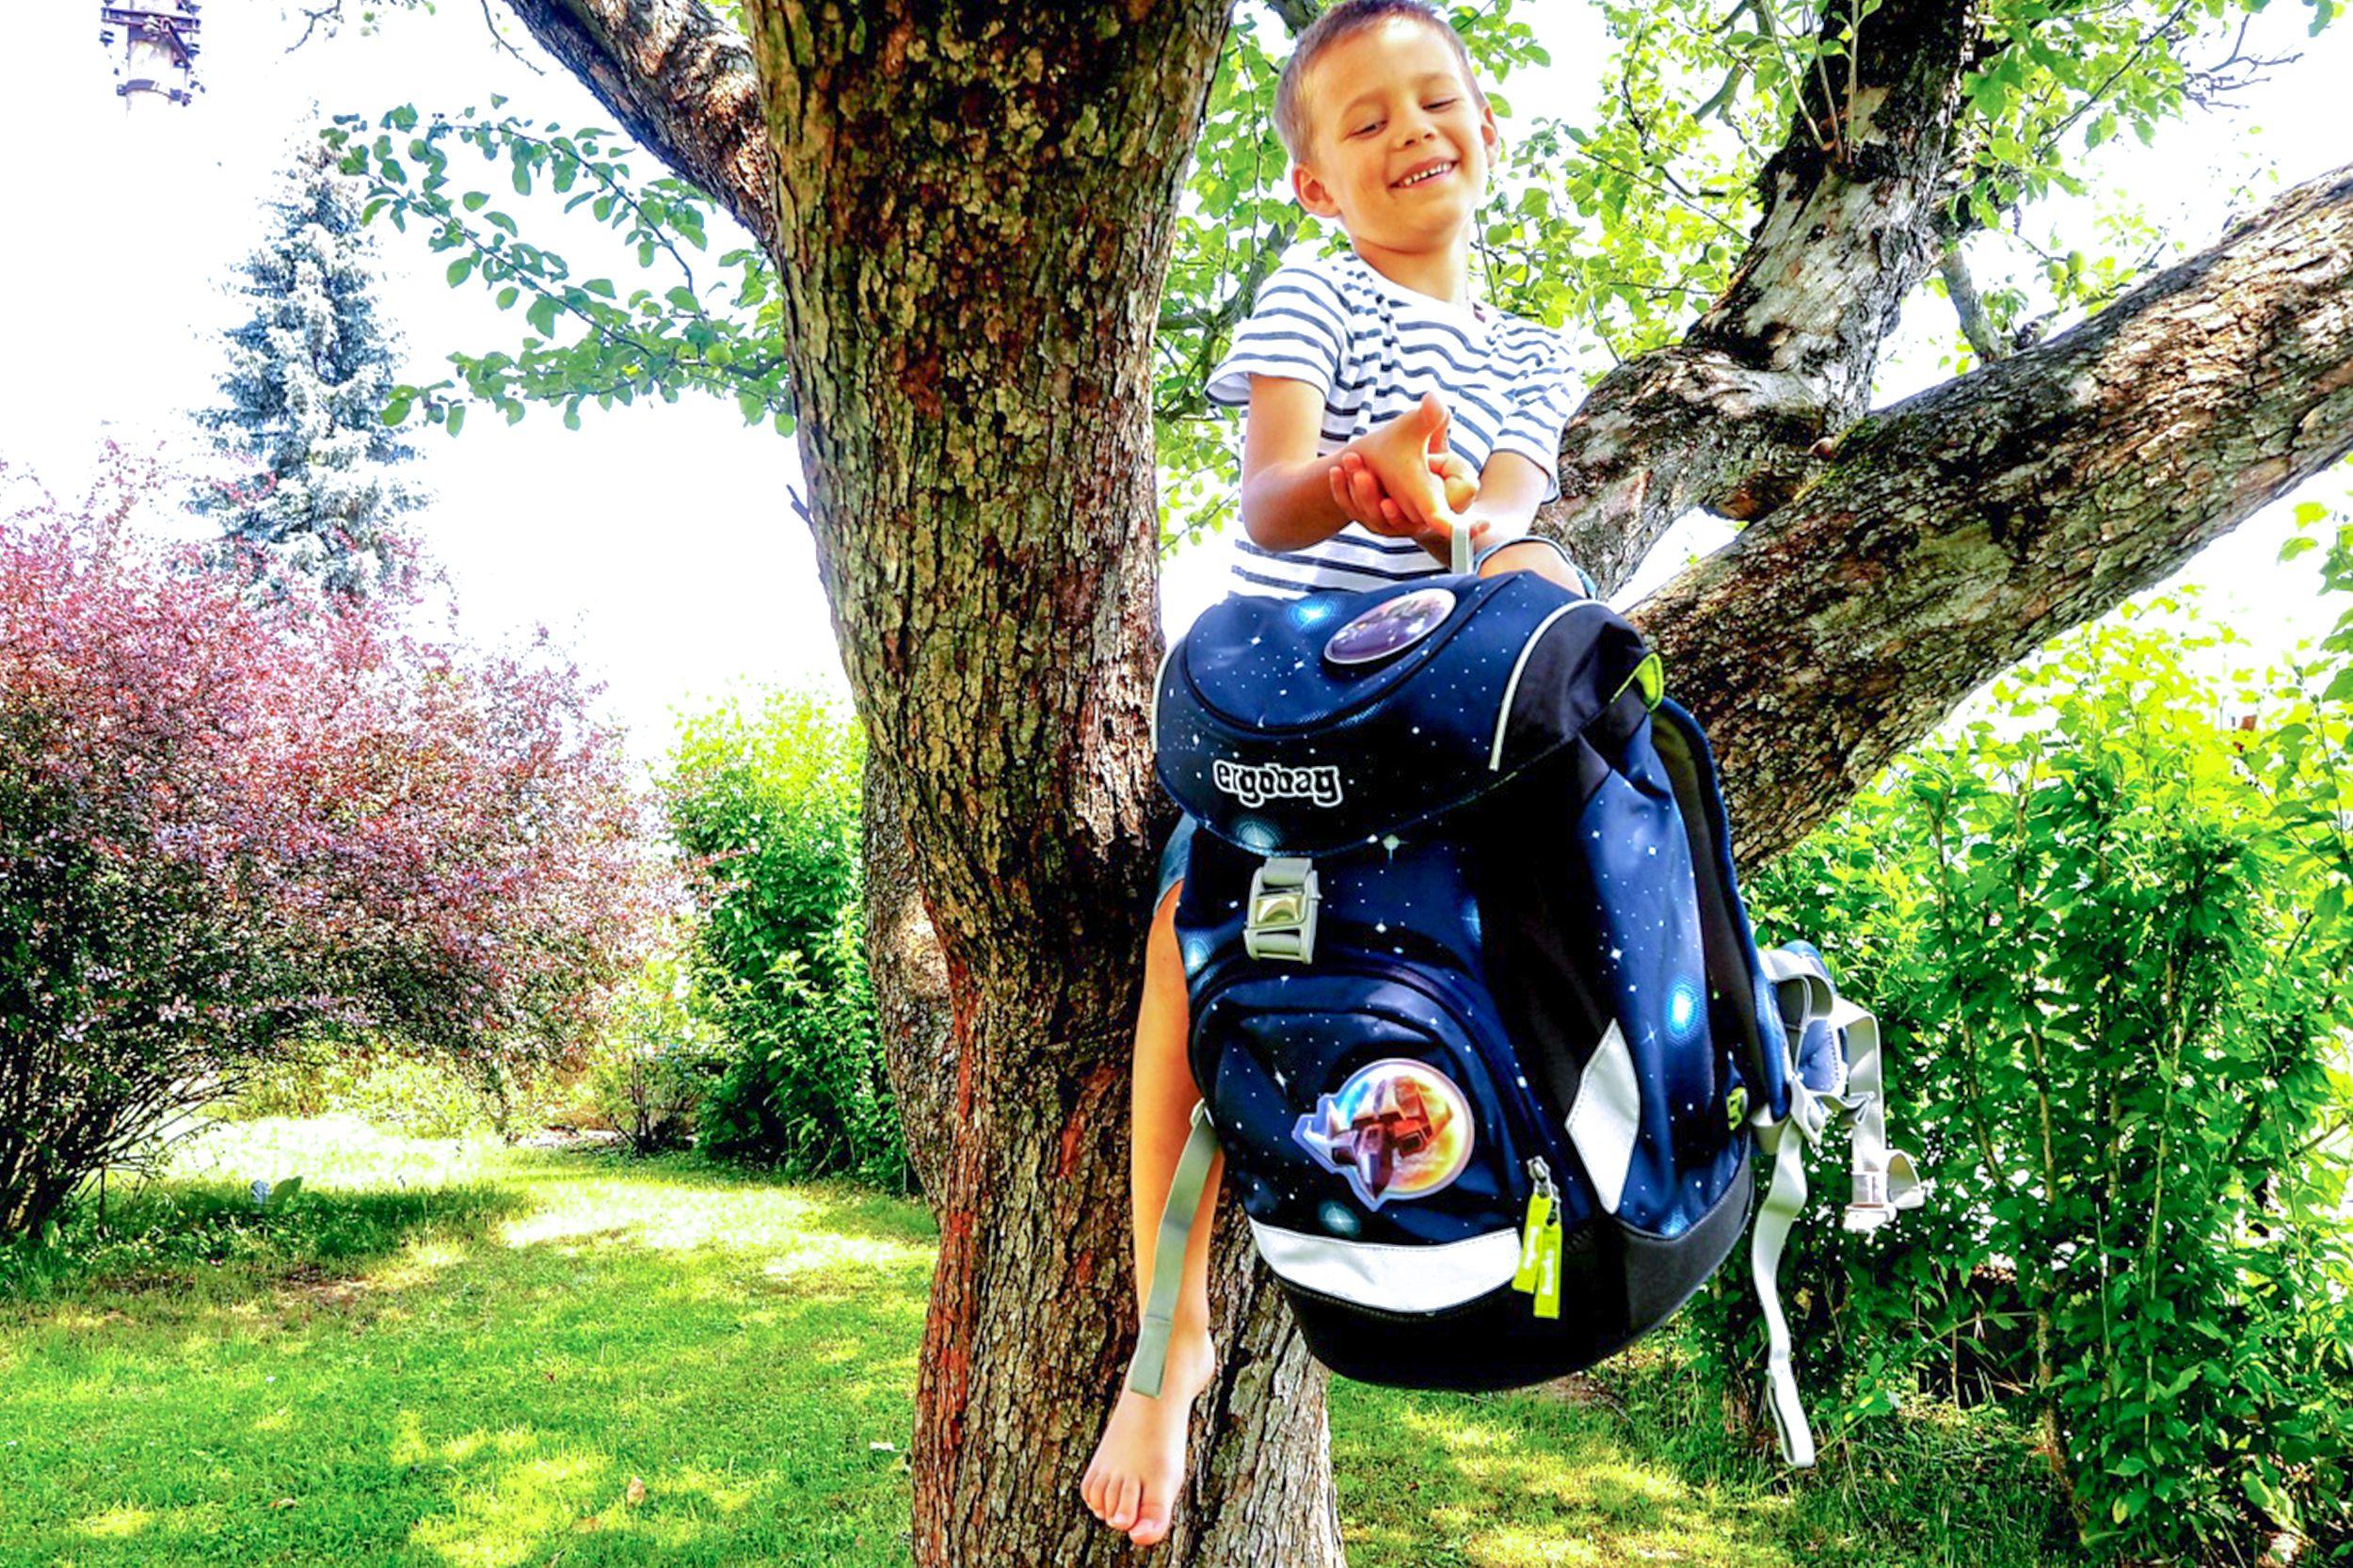 ergobag-boy-tree-vacation